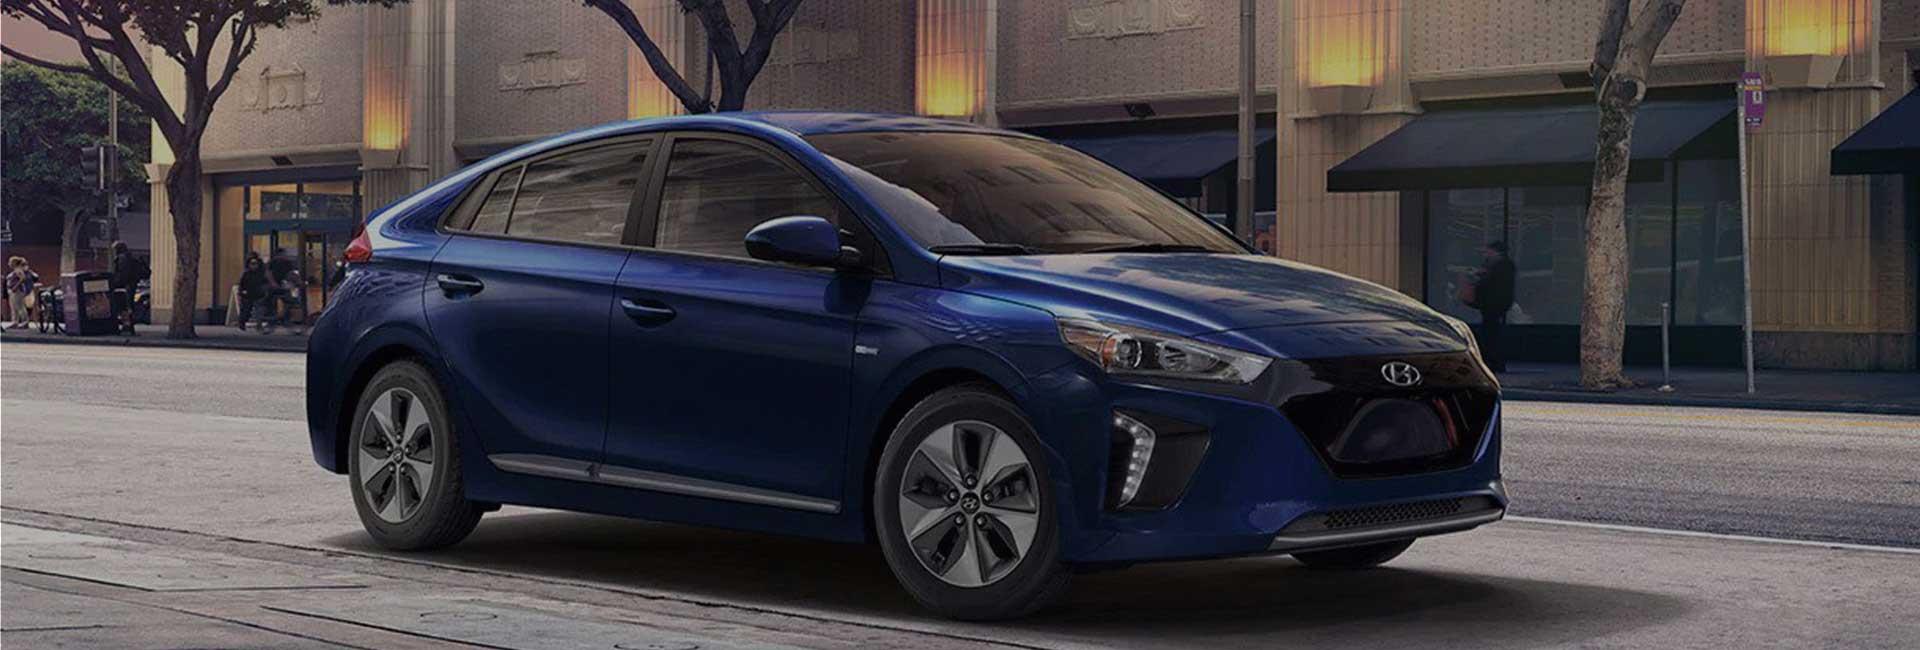 Buy Ioniq Ev Hyundai Sri Lanka